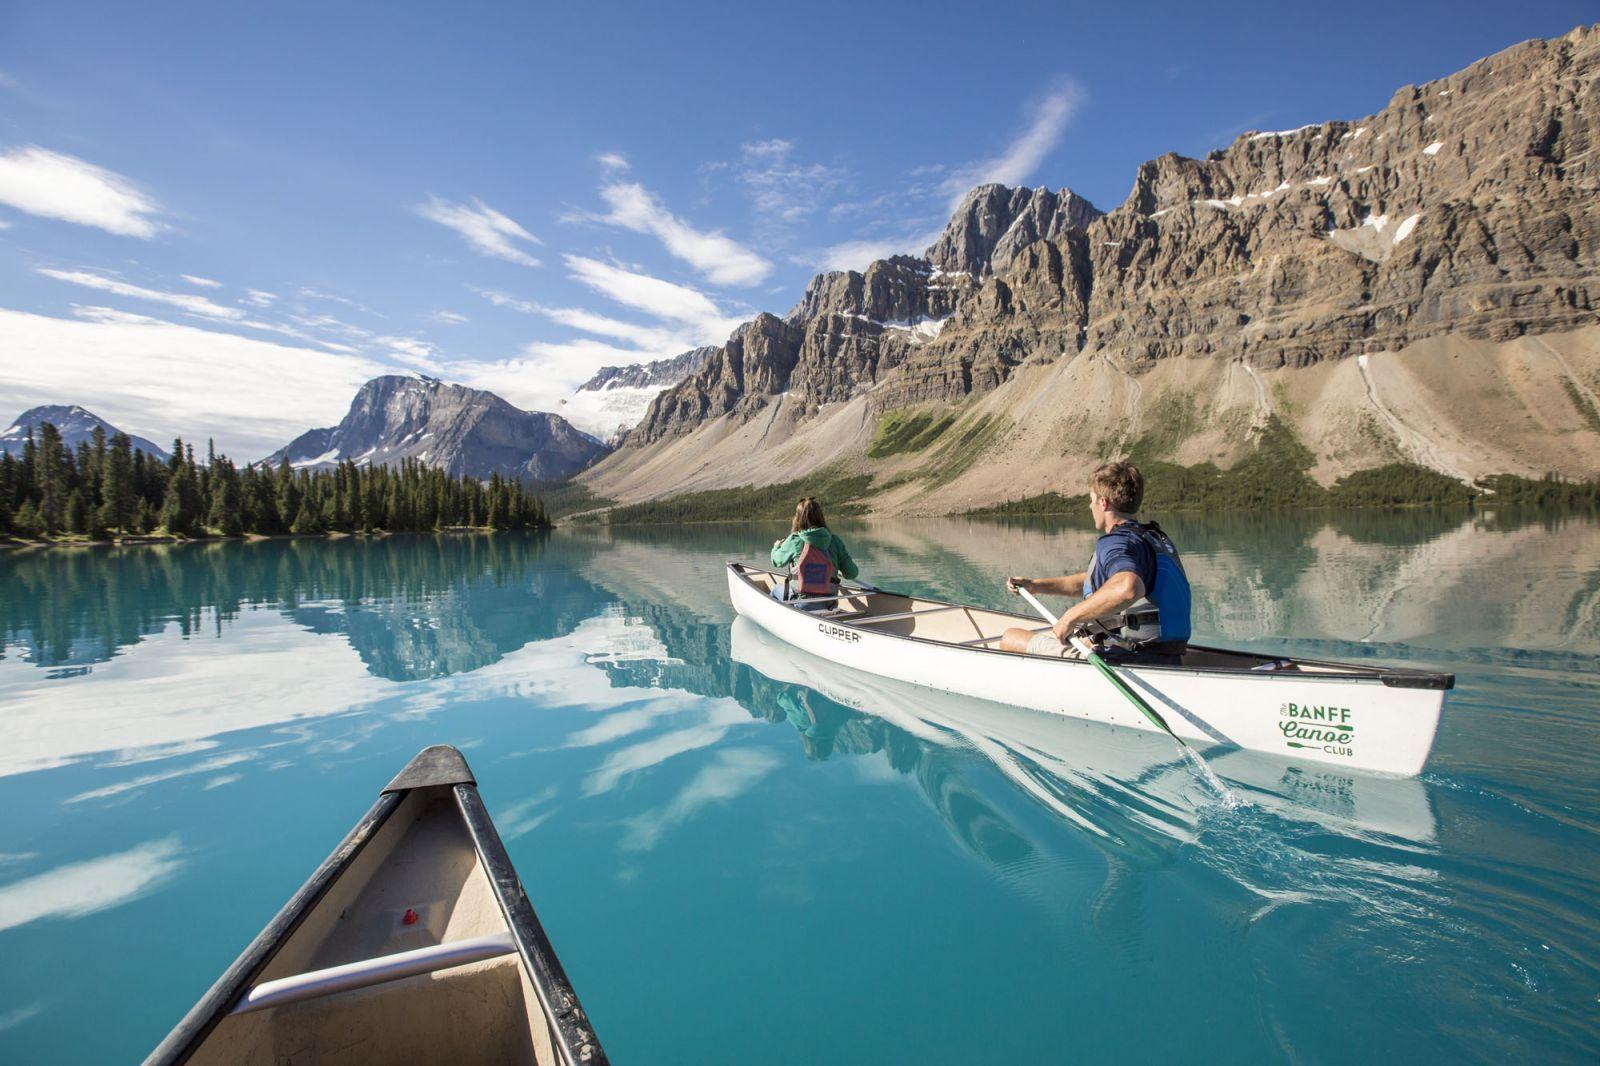 canoeing_bow_lake_noel_hendrickson_3_horizontal.jpg